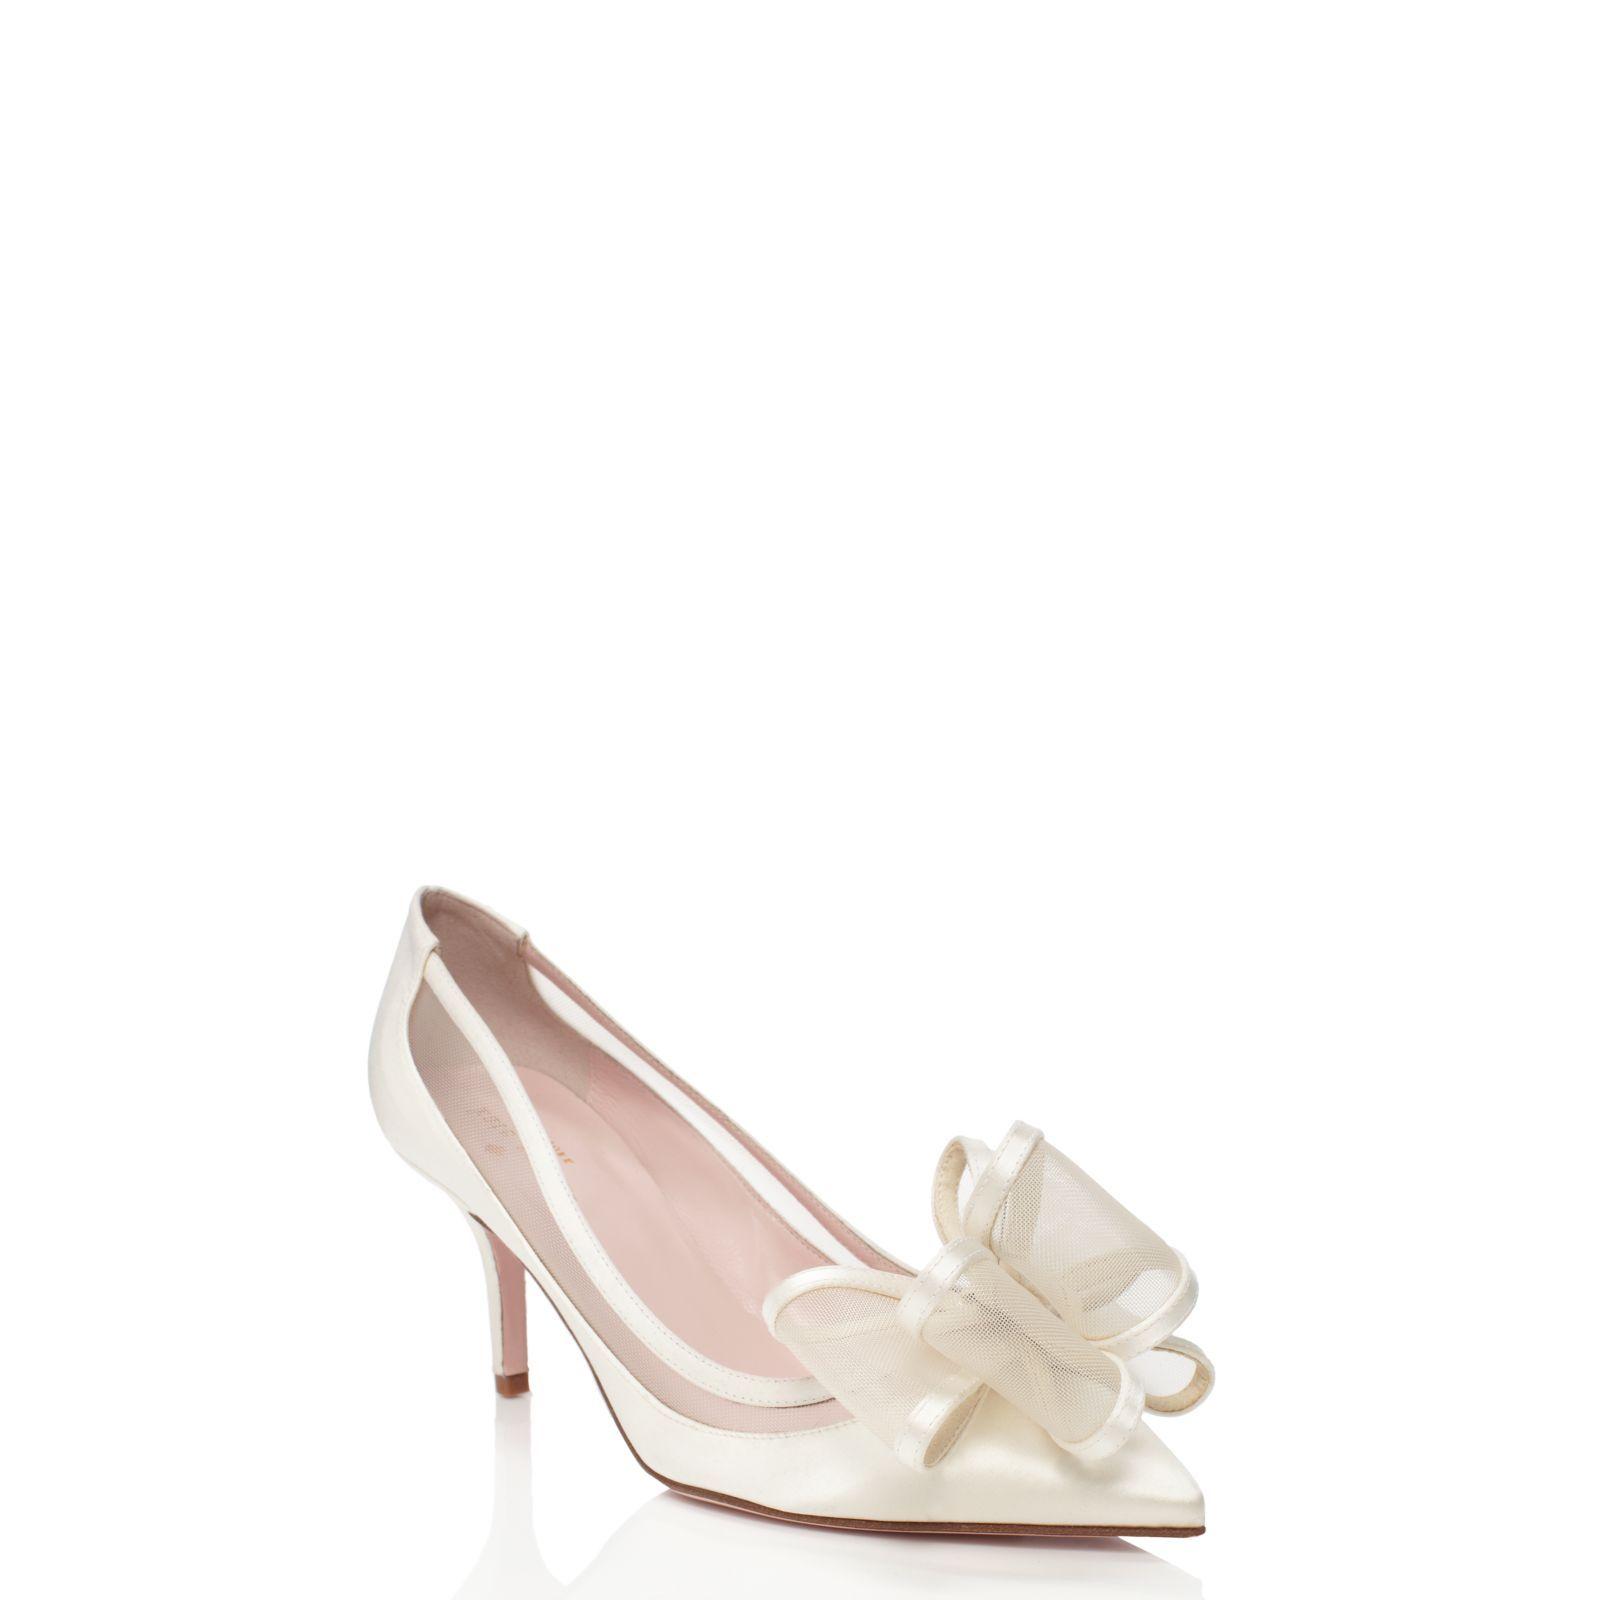 "Kate Spade Jackie Heels, $350; &lt;a href=""http://m.katespade.com/categories/ks-bridal-shoes/products#lct-1497""&gt;katespade.com&lt;/a&gt;   <!--EndFragment-->"